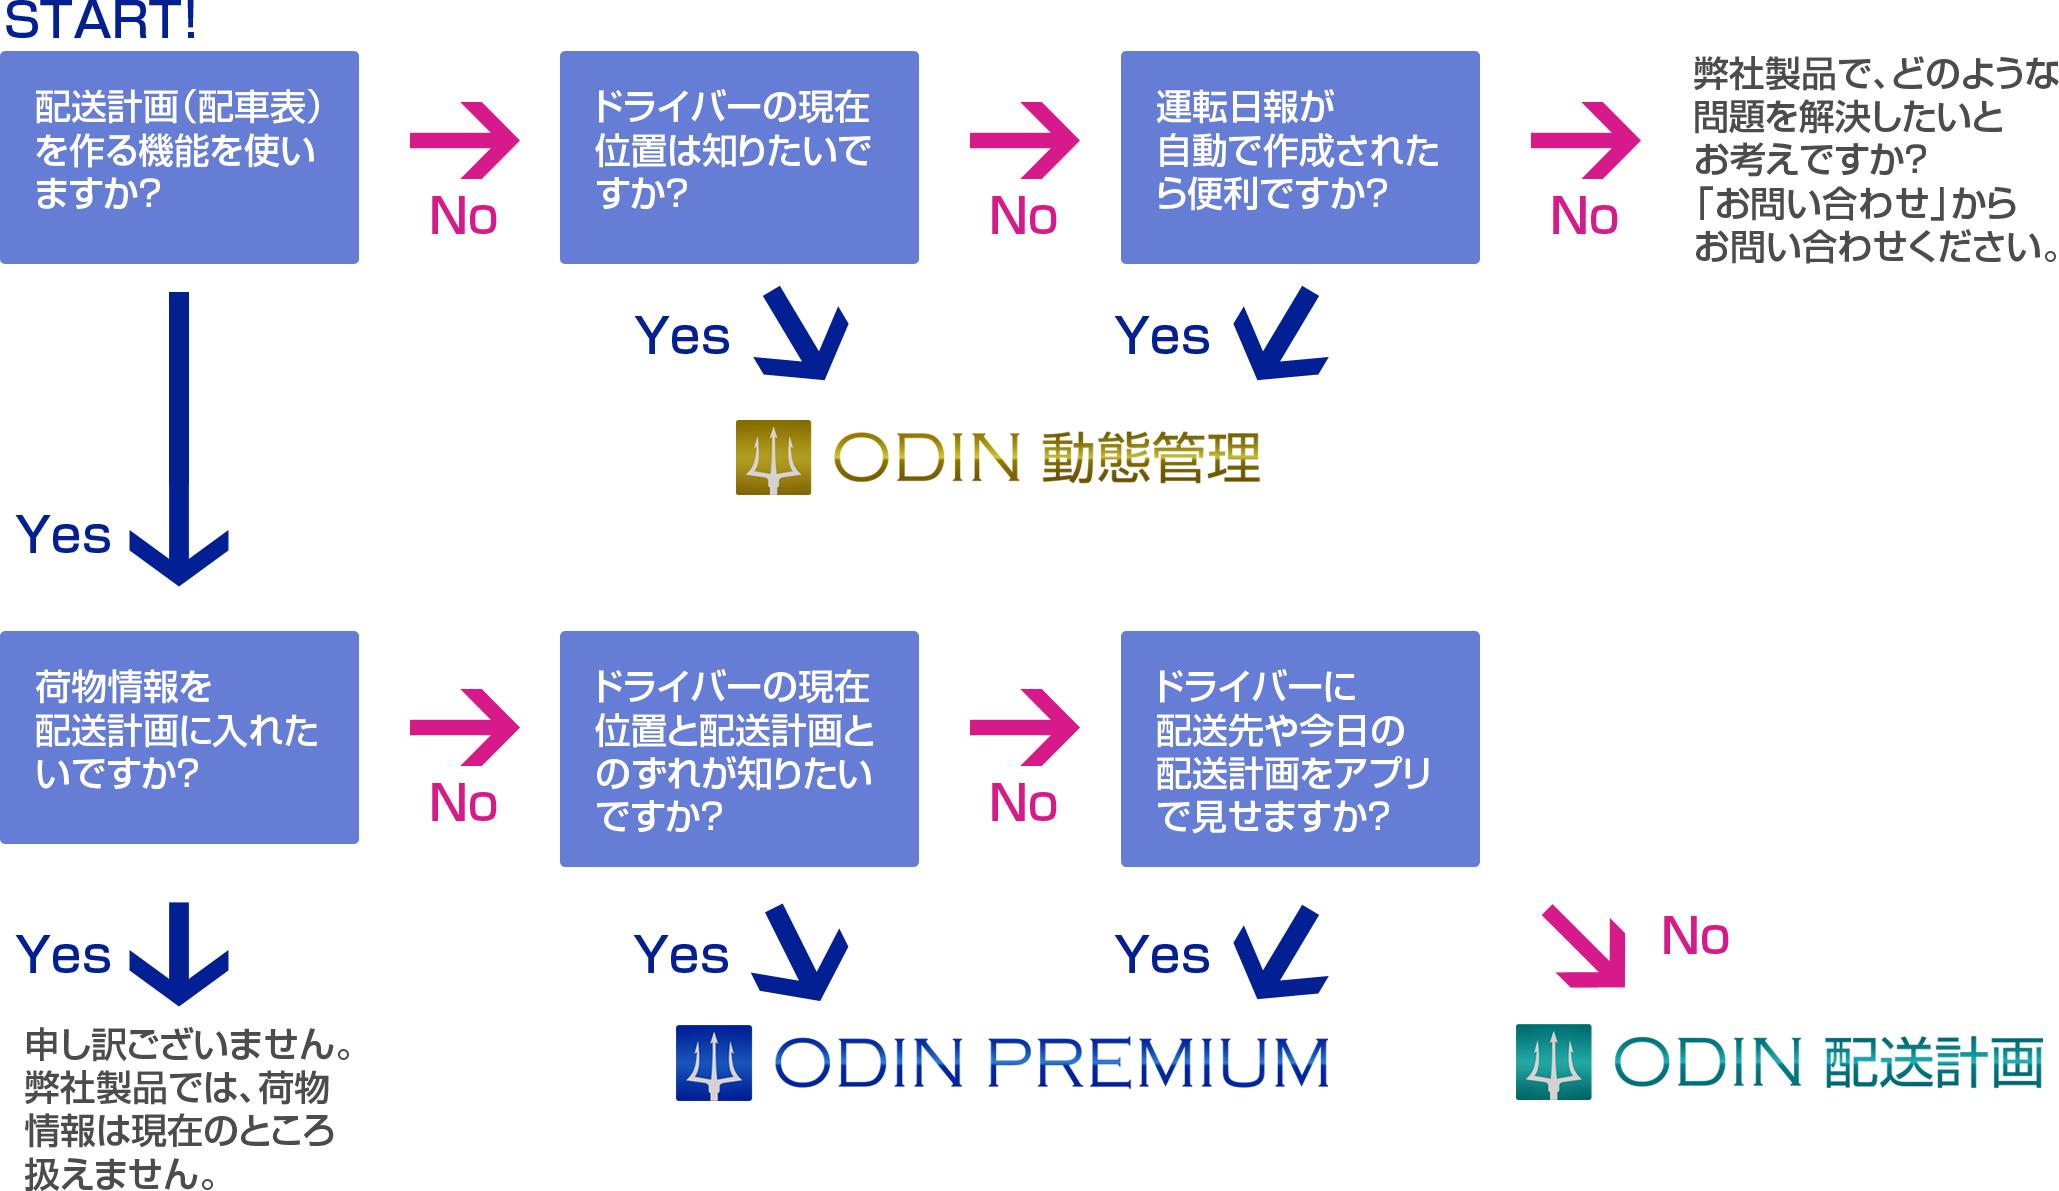 ODIN製品選択フローチャート